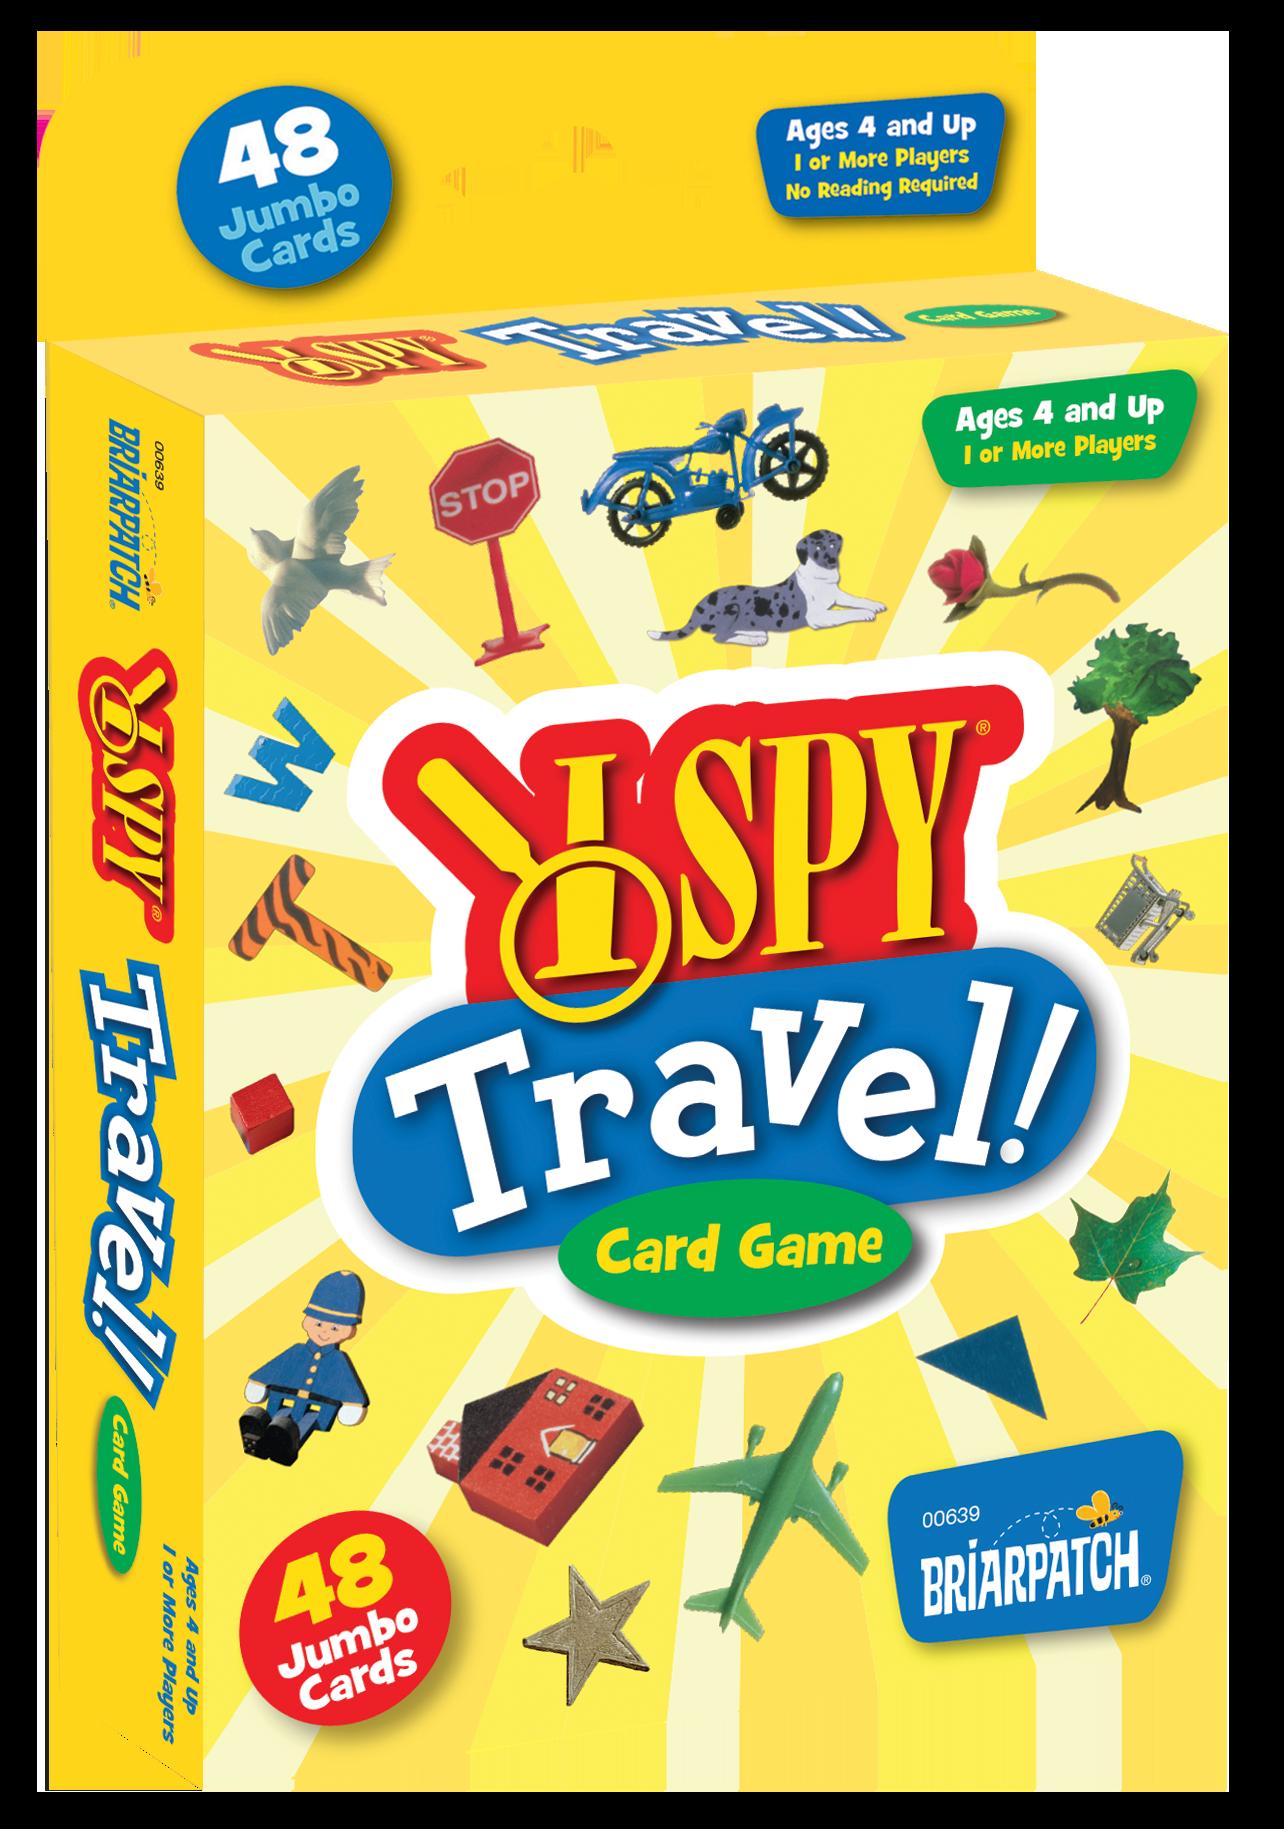 00639_ISpy_TravelCardGameFINAL